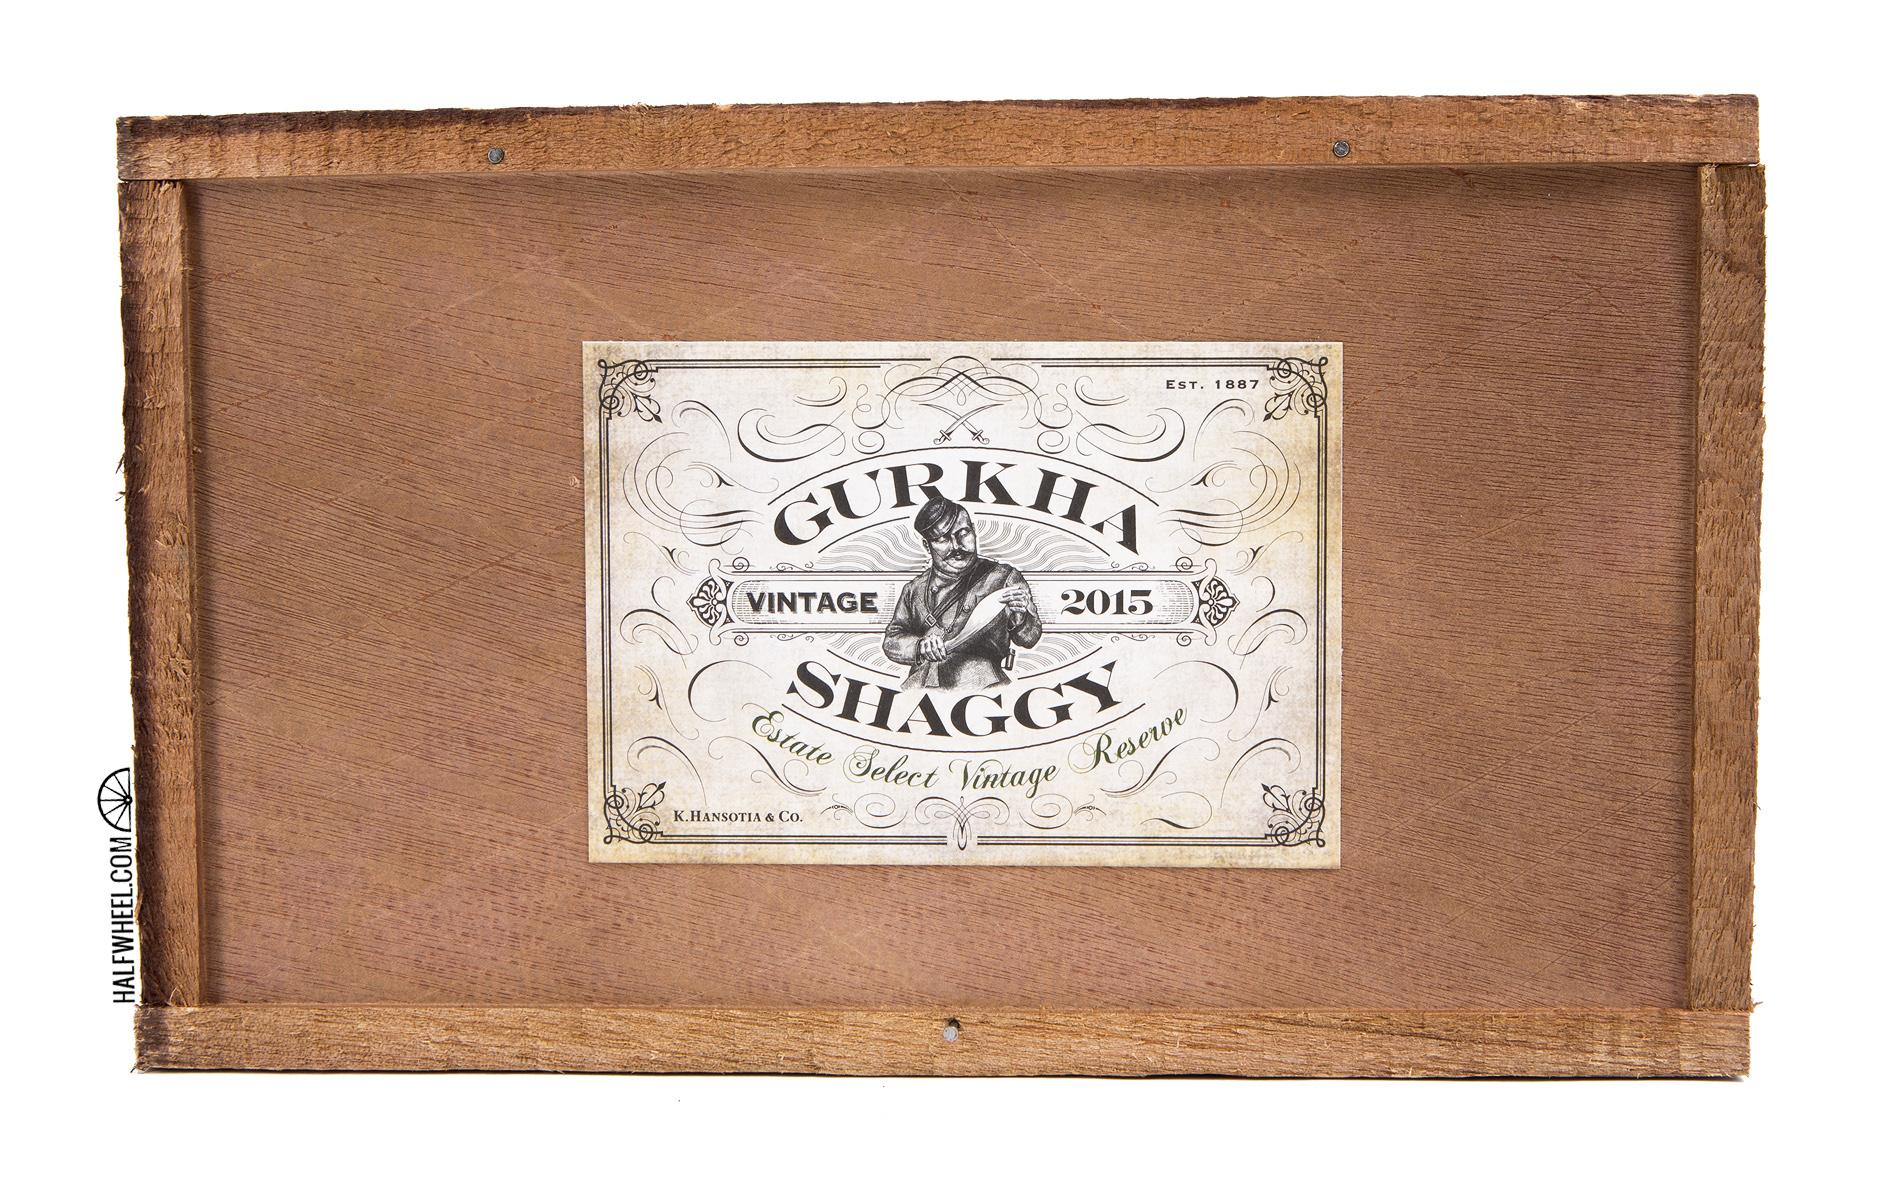 Gurkha Shaggy Vintage Robusto (2016) Box 1